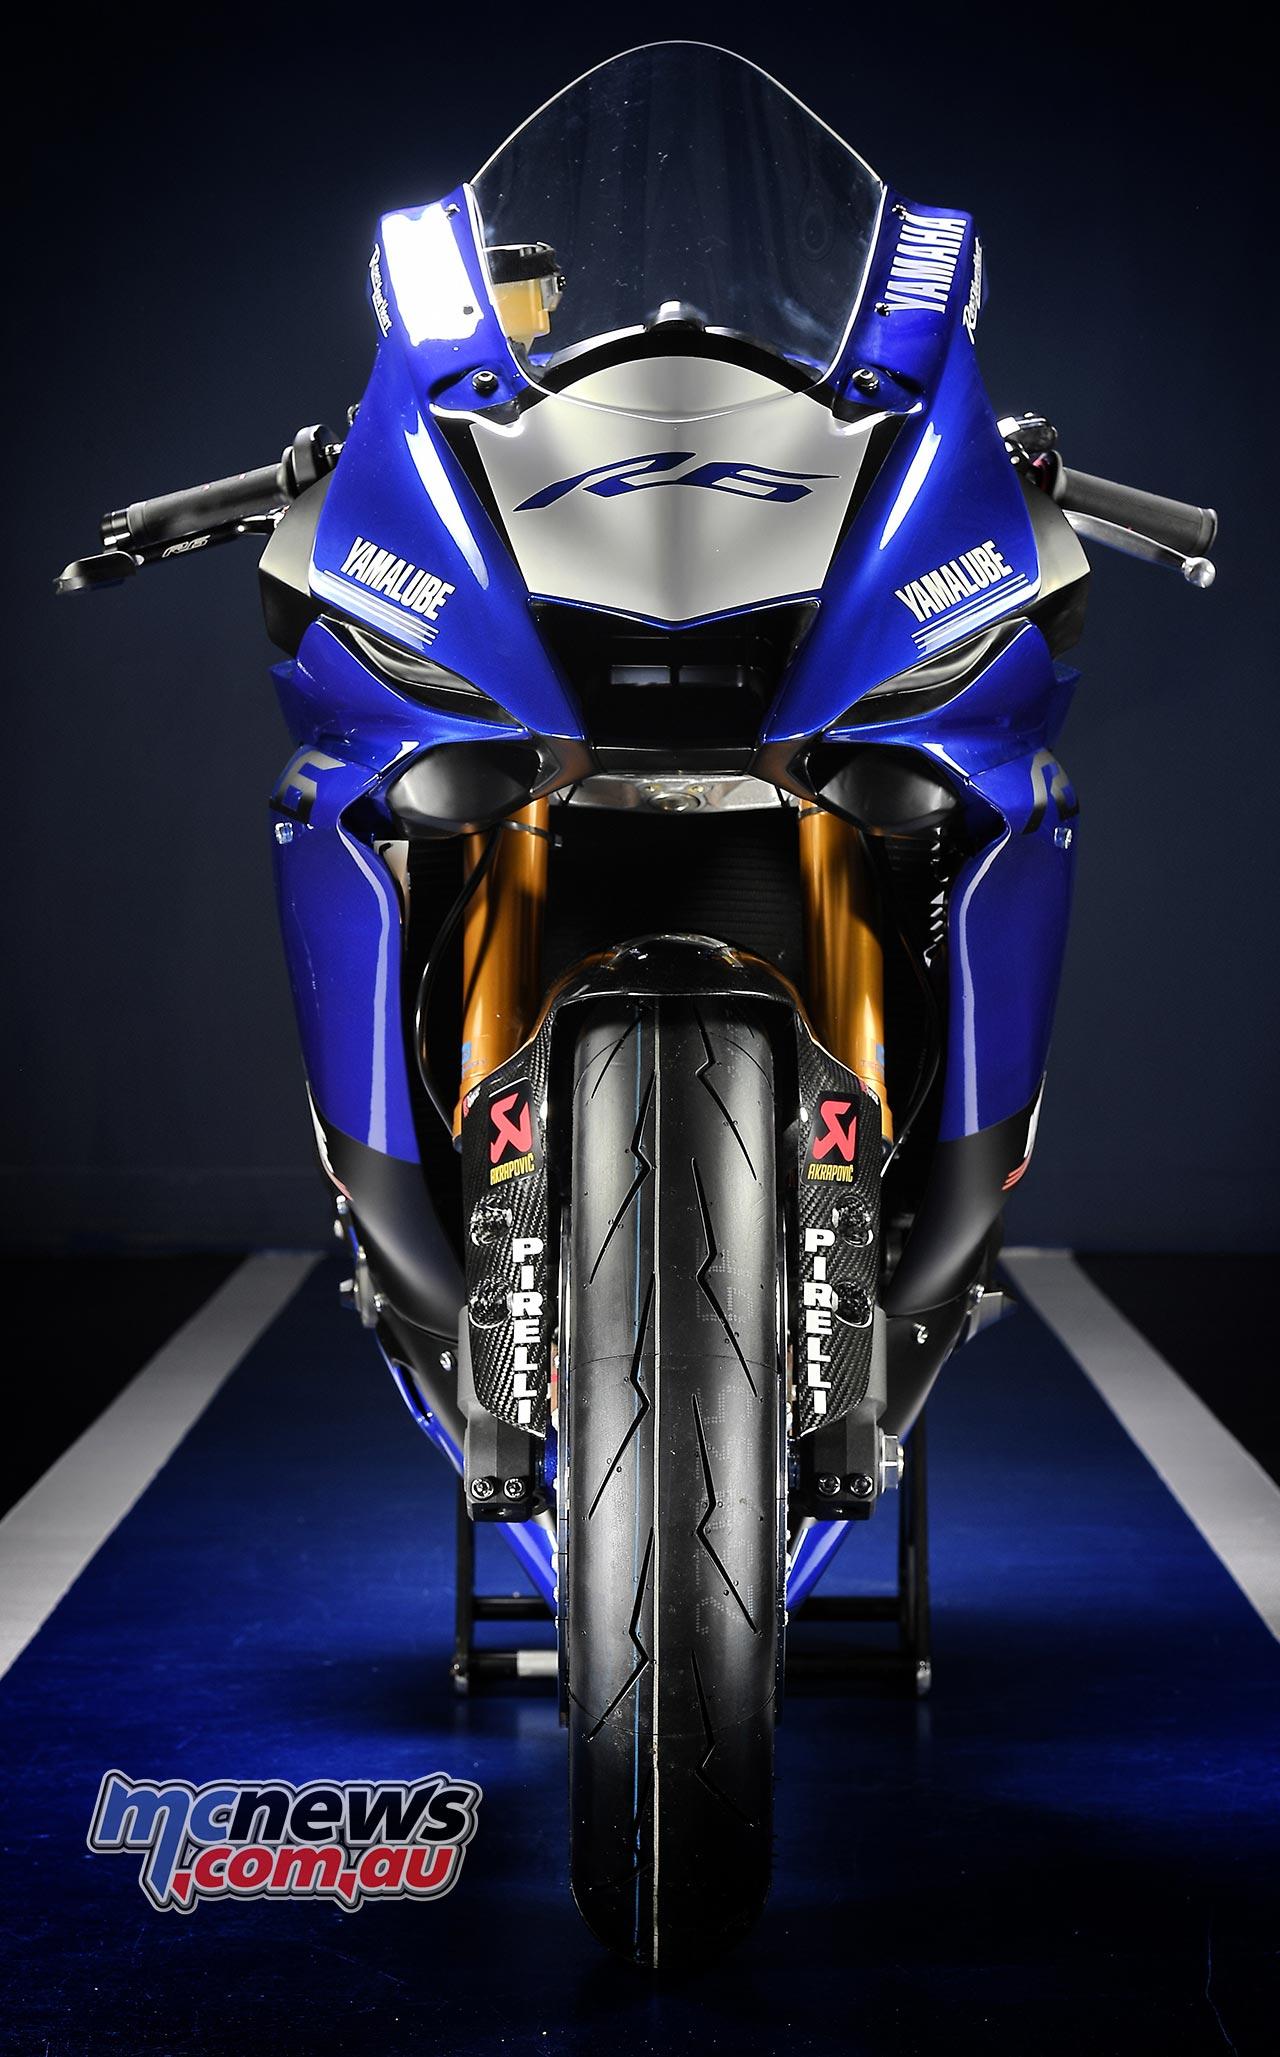 2017 Yamaha YZF R6 In Race Trim